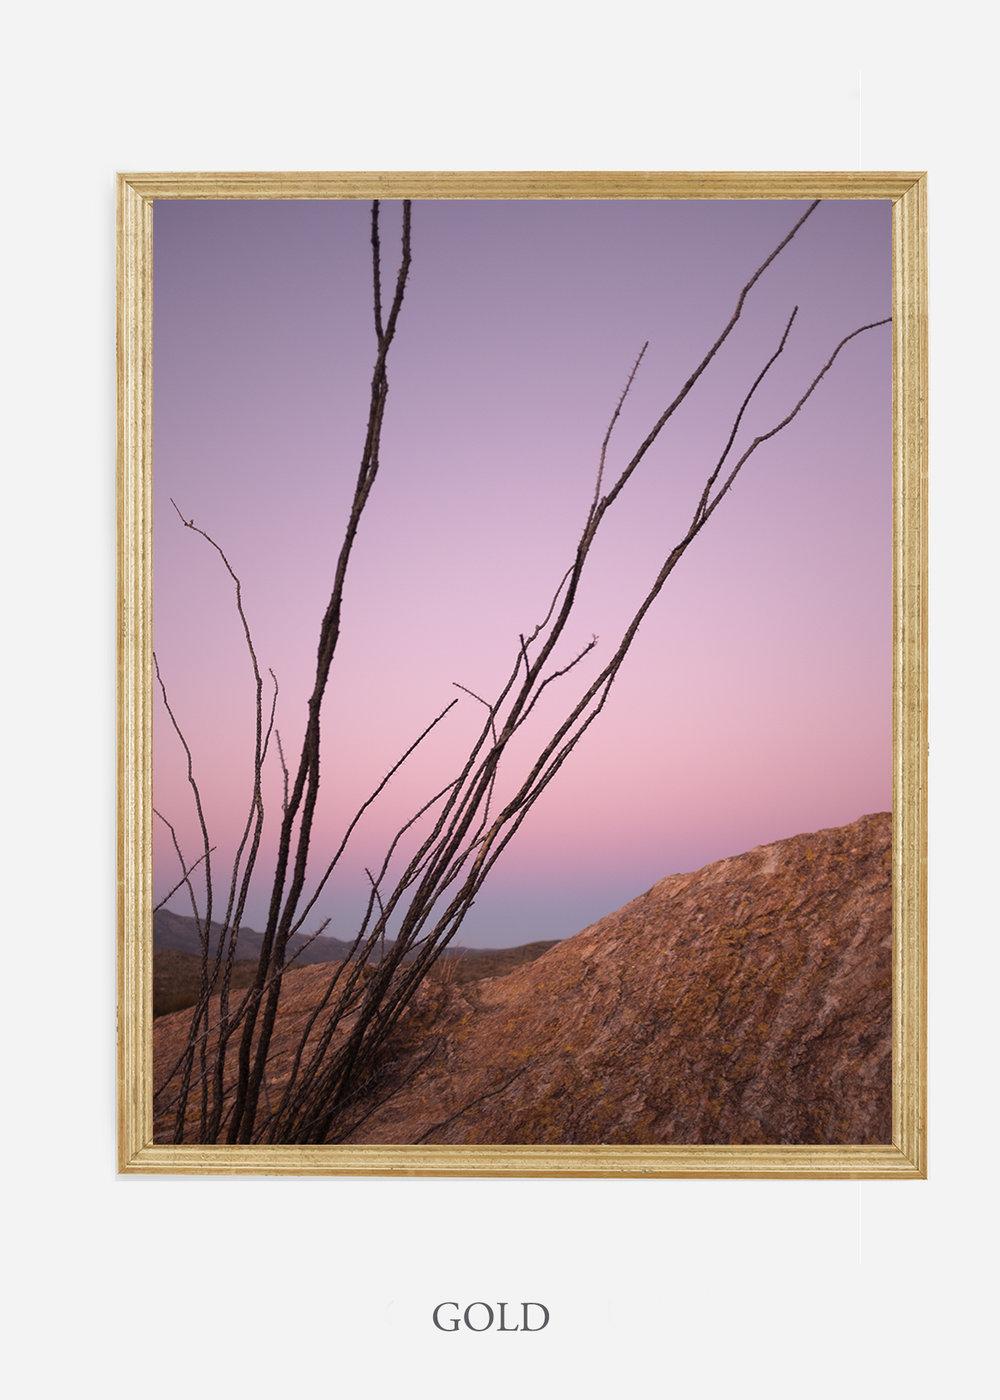 nomat-goldframe-saguaroNo.12-wildercalifornia-art-wallart-cactusprint-homedecor-prints-arizona-botanical-artwork-interiordesign.jpg